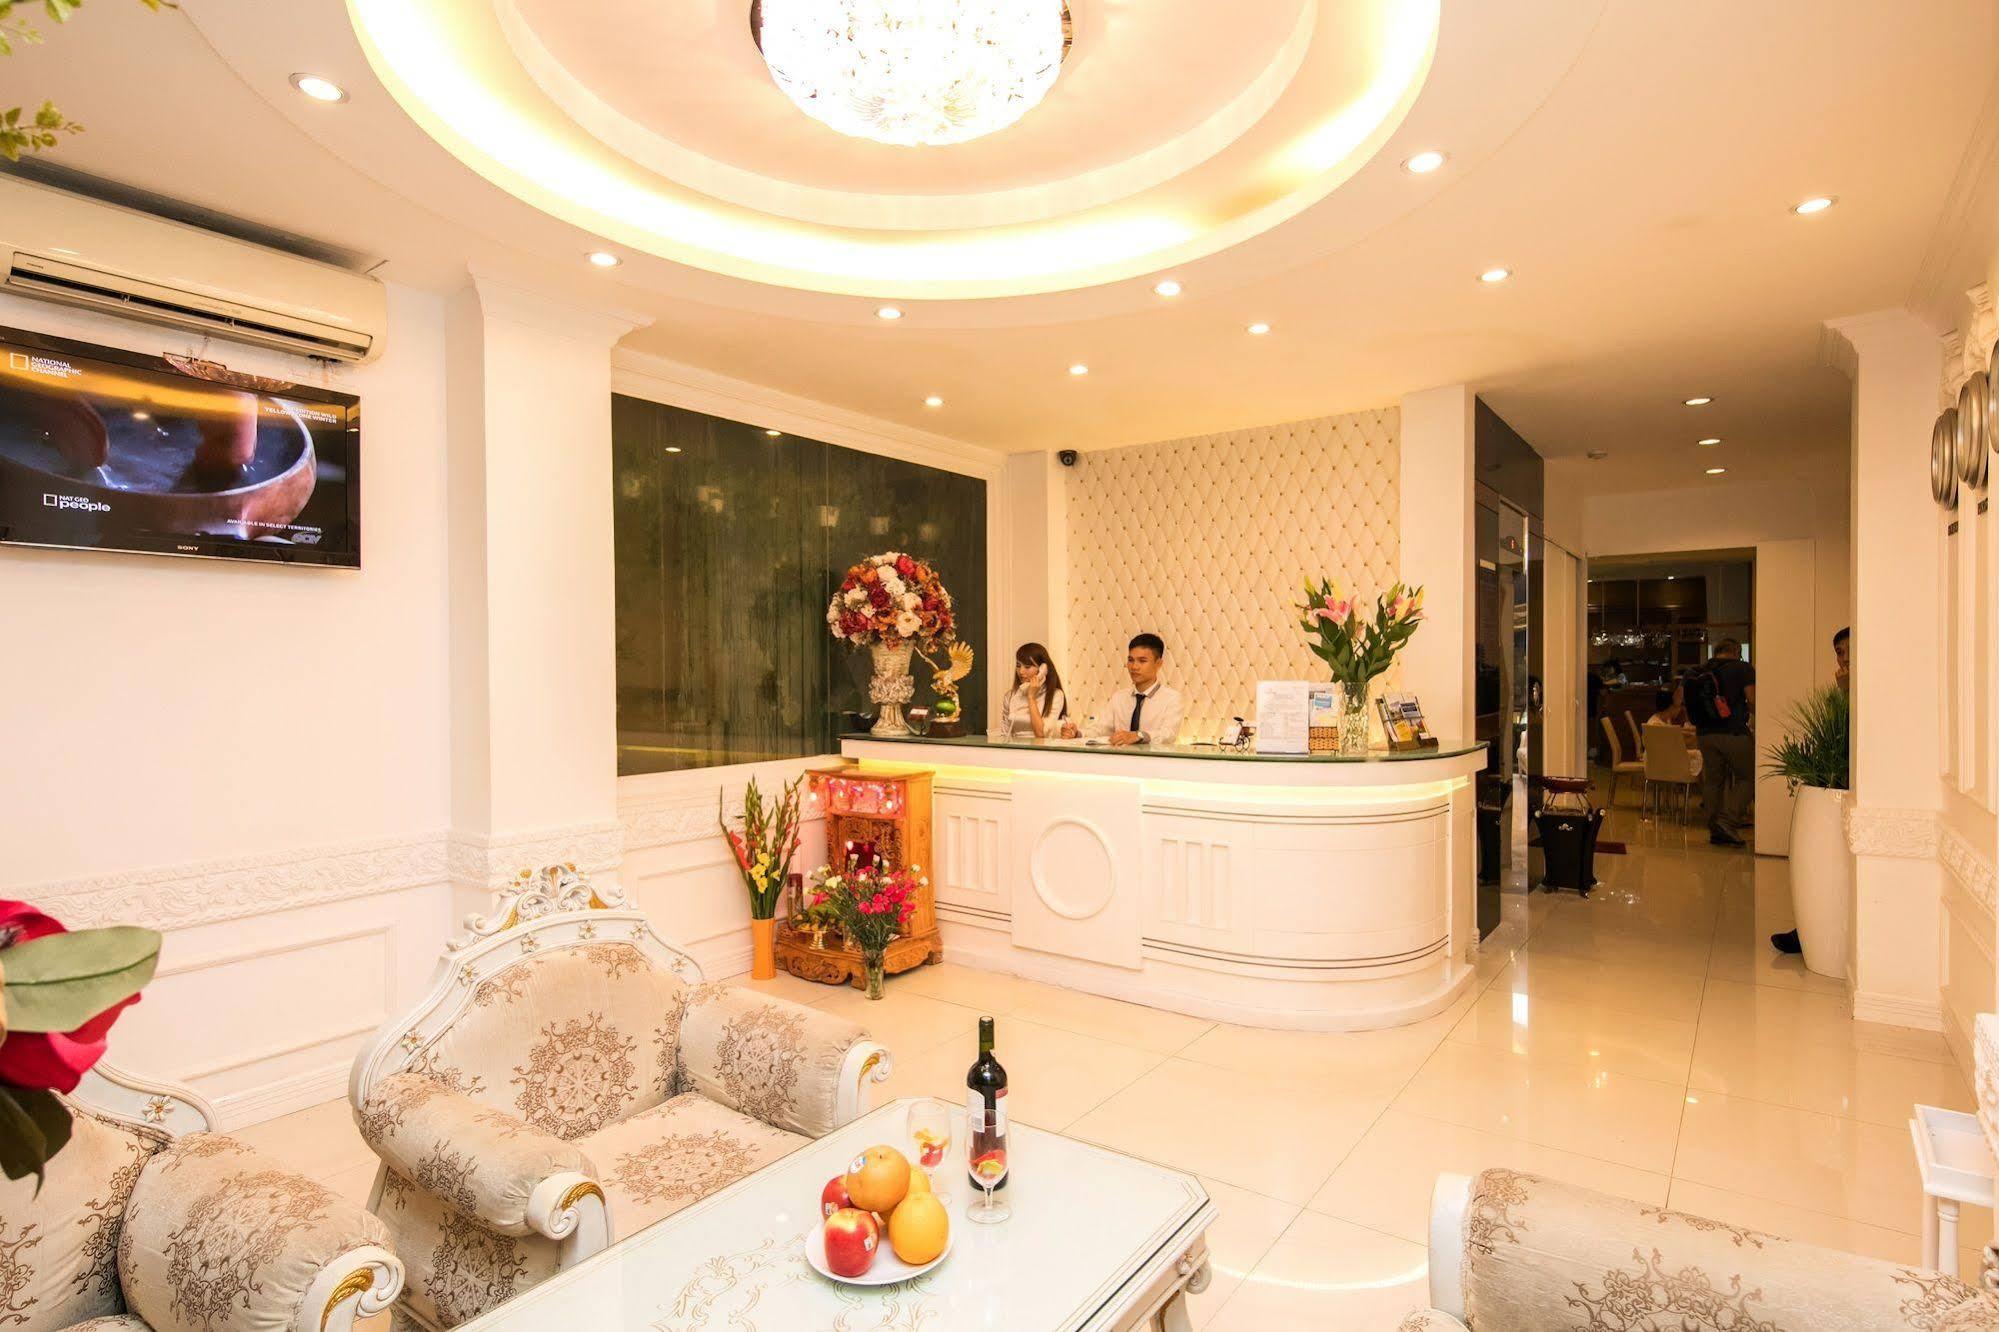 The White Luxury